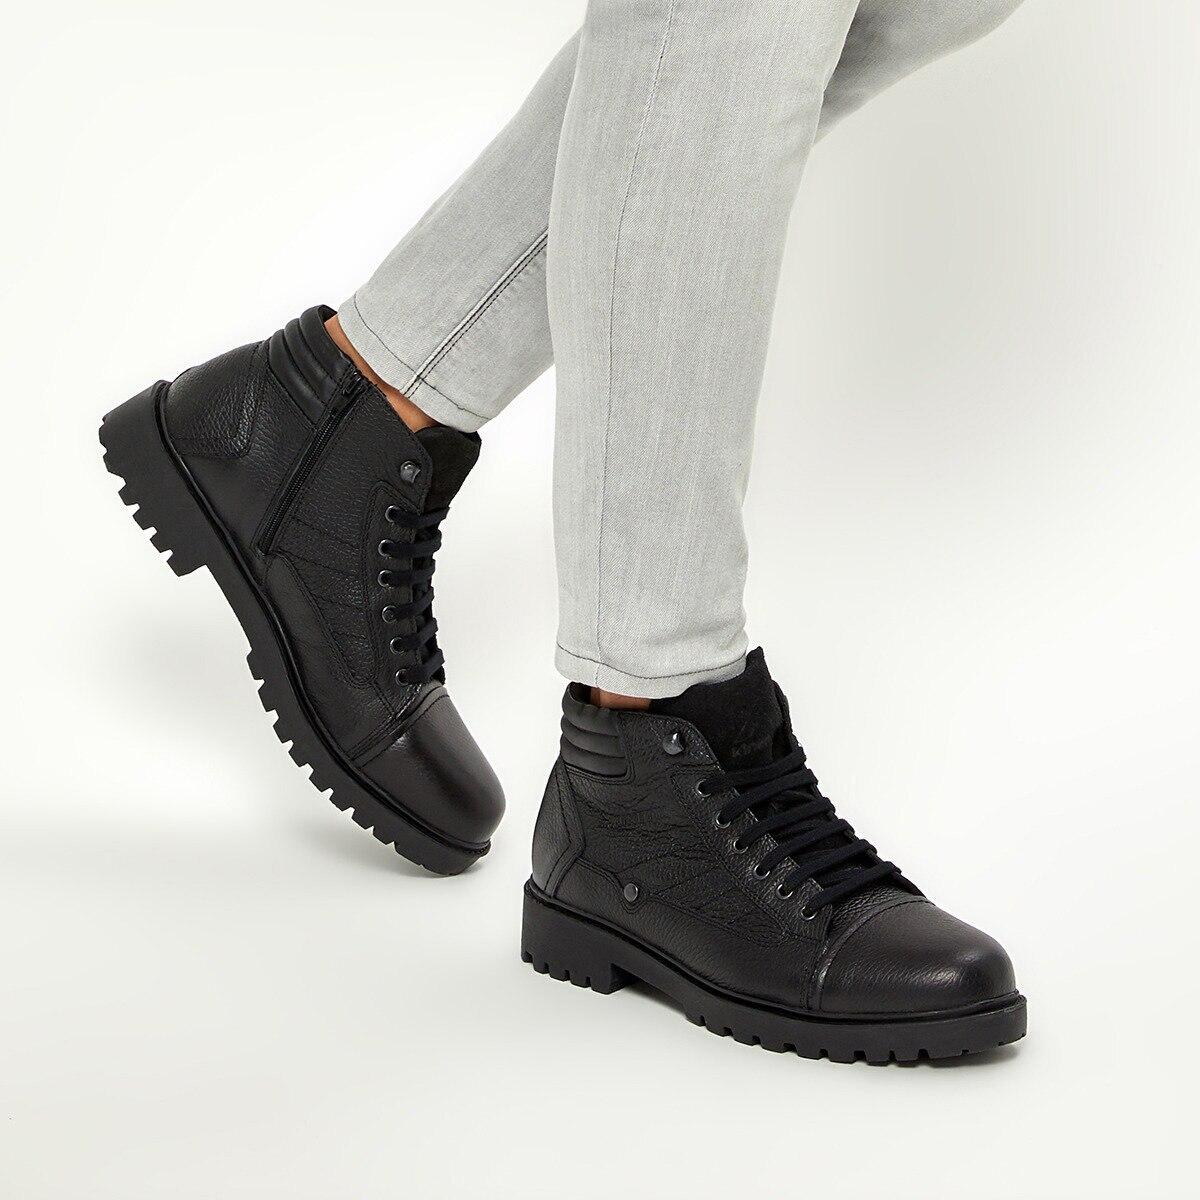 FLO KENTON 9PR Black Men Boots KINETIX